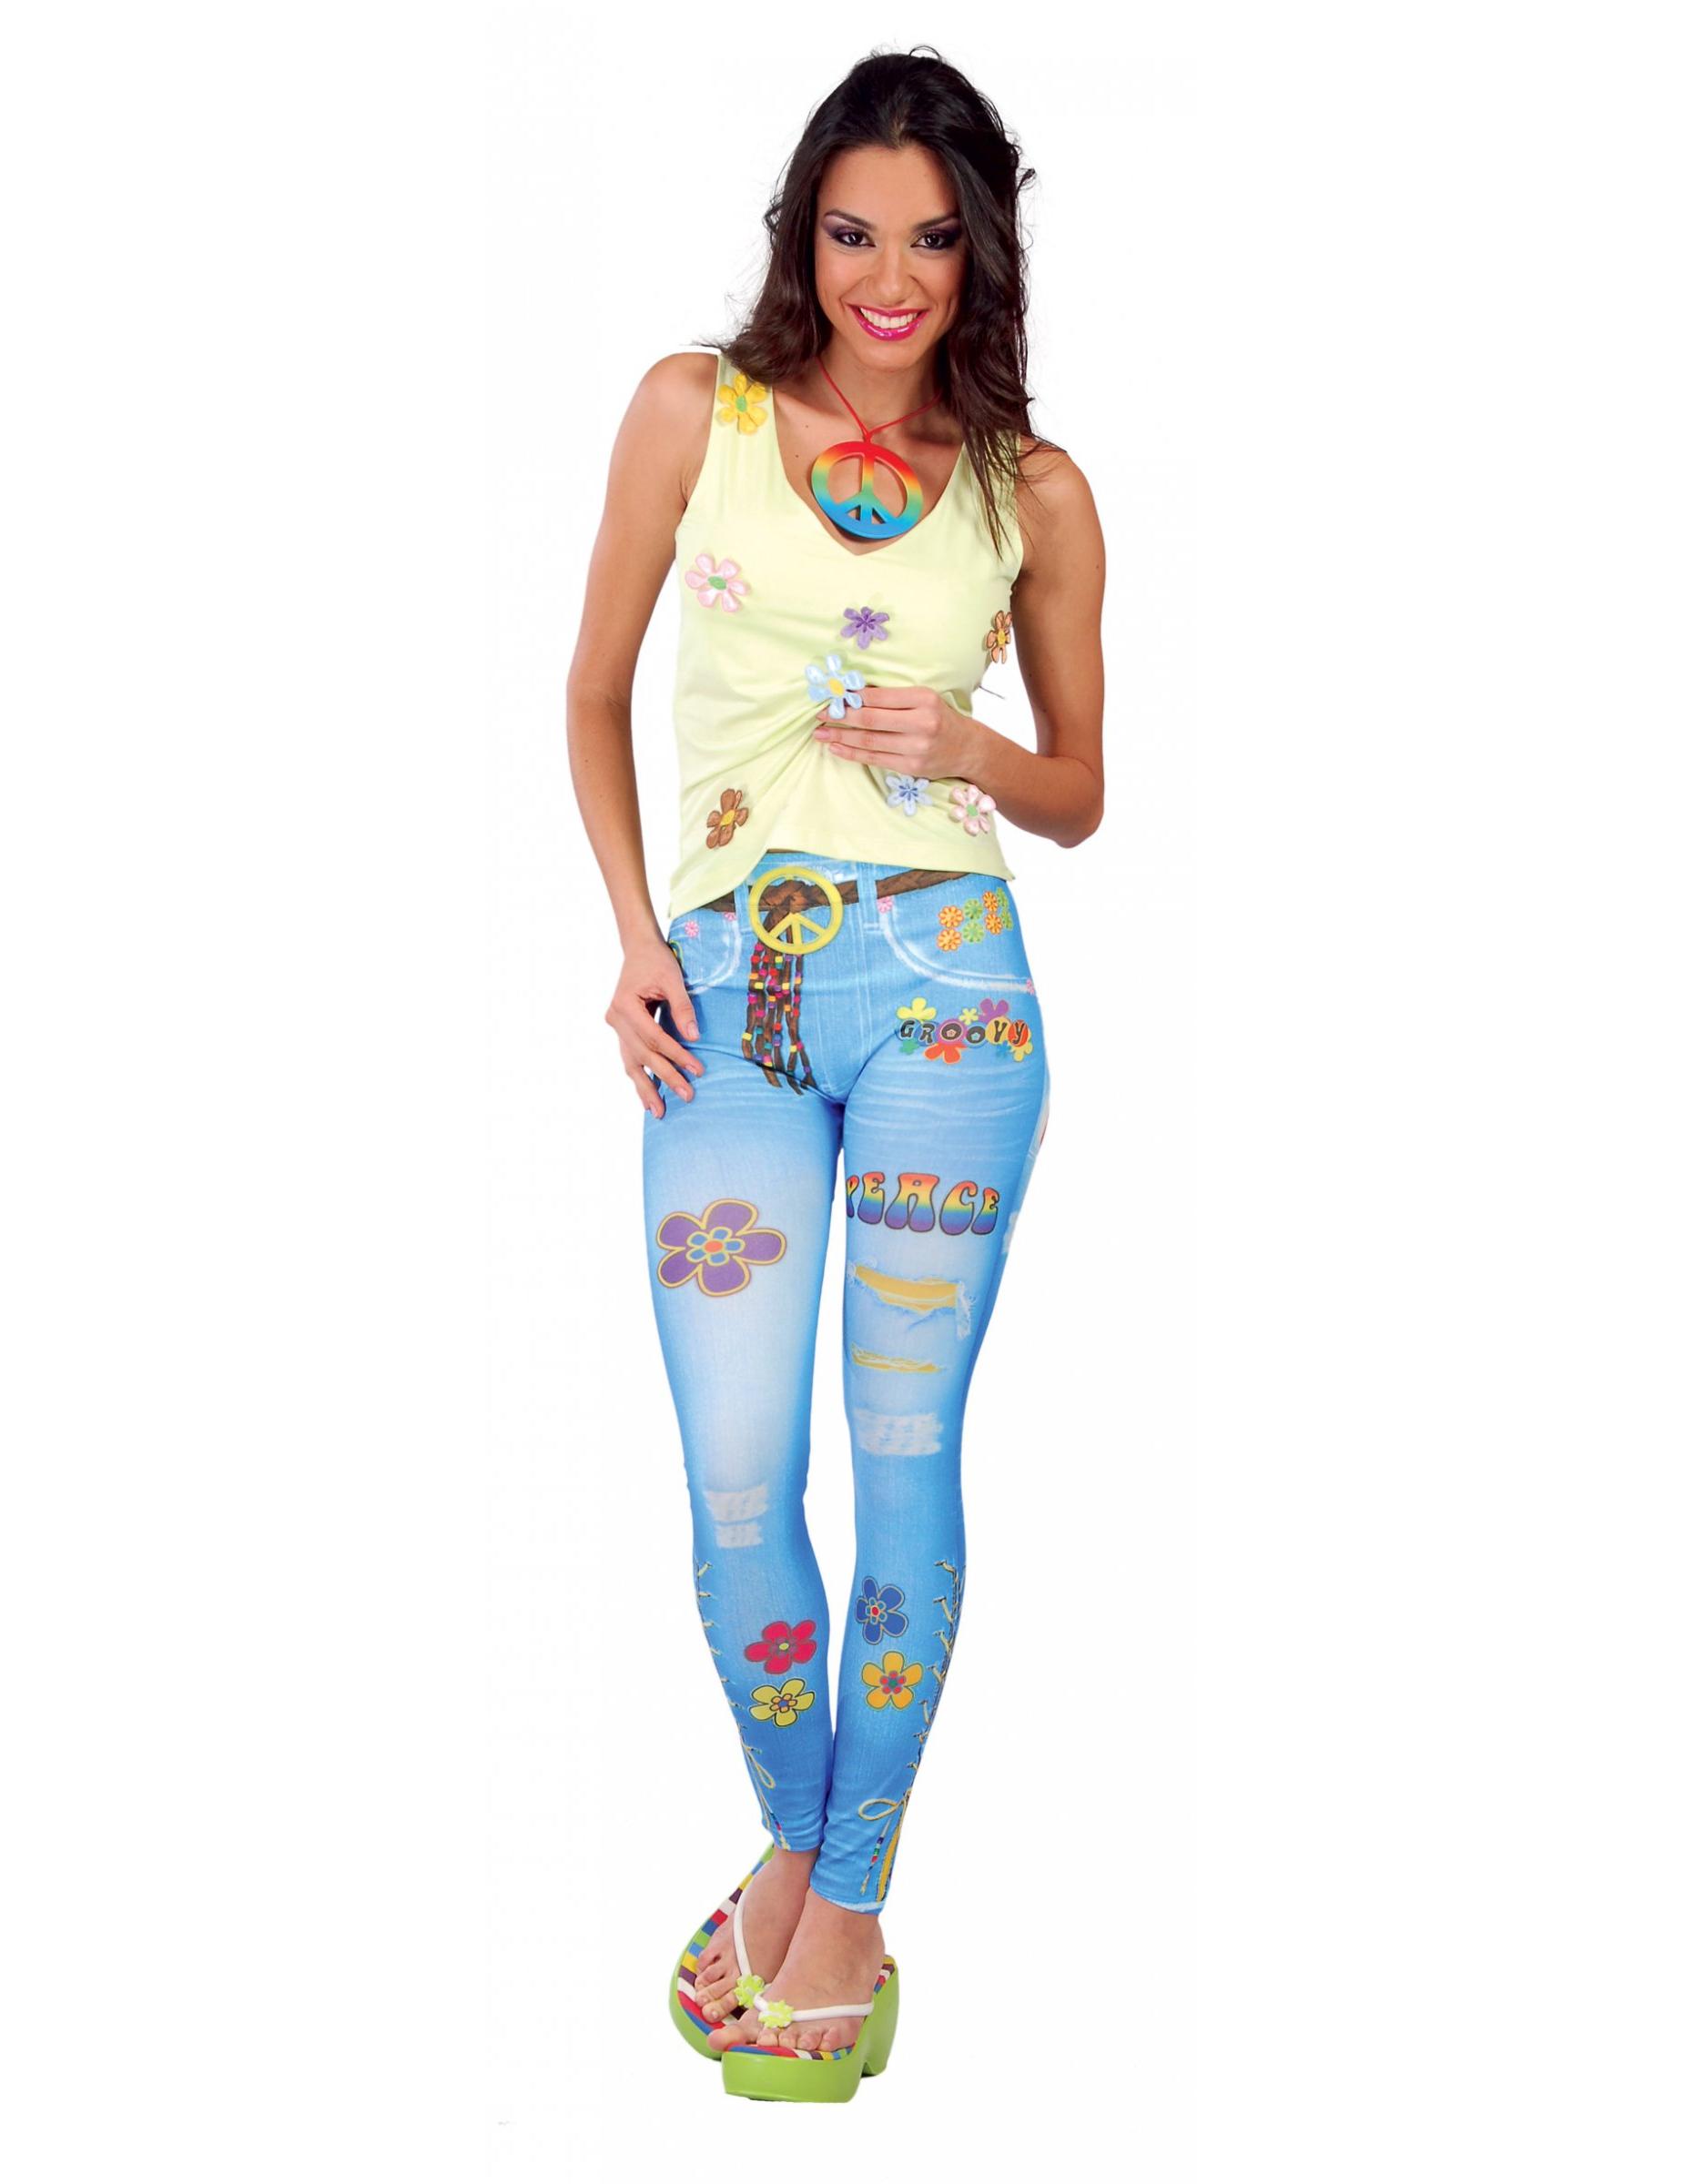 hippie leggings im jeans look f r damen kost me f r erwachsene und g nstige faschingskost me. Black Bedroom Furniture Sets. Home Design Ideas